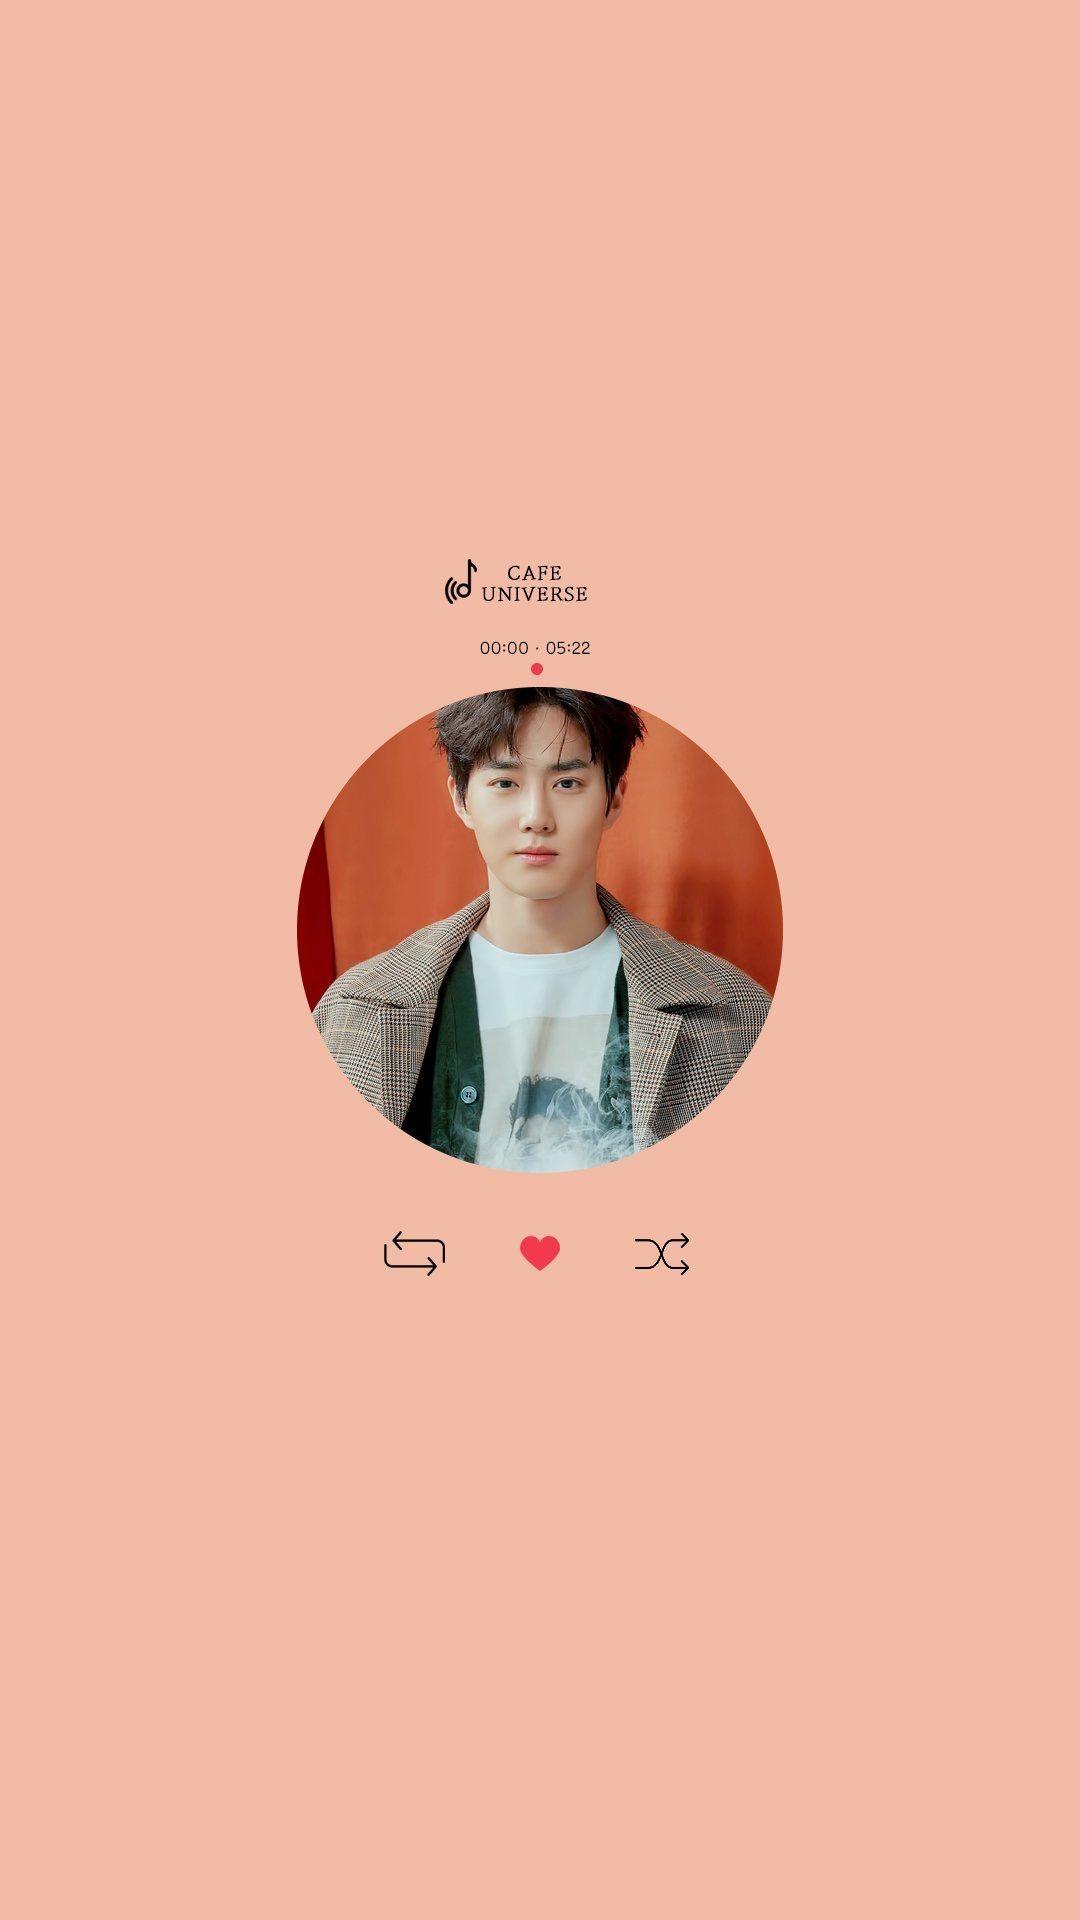 Exo #wallpaper | EXO | Pinterest | Exo, Wallpaper and Suho